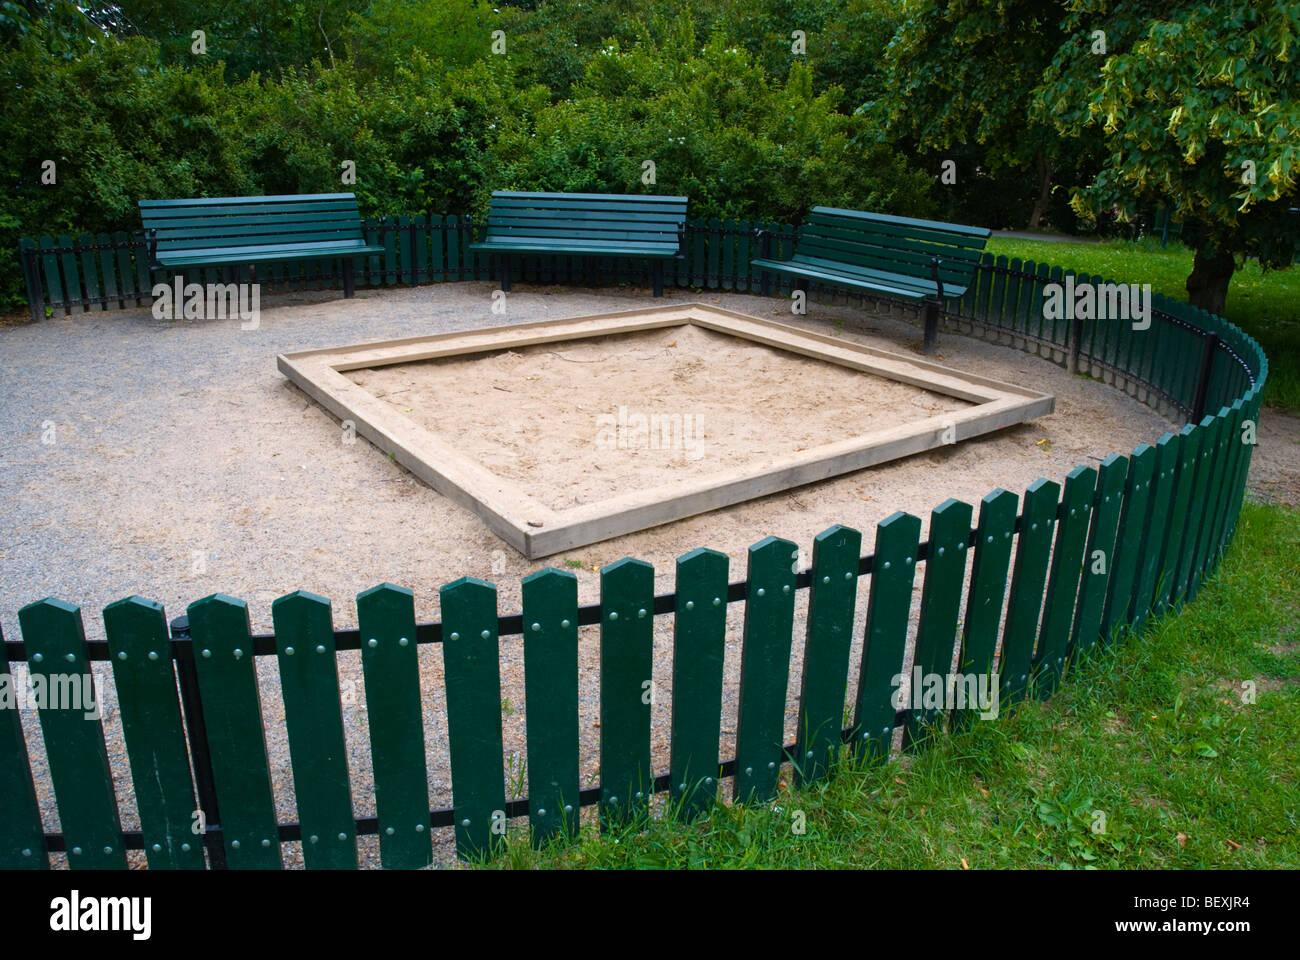 Childrens play area at Observatorielunden park in Stockholm Sweden Europe - Stock Image